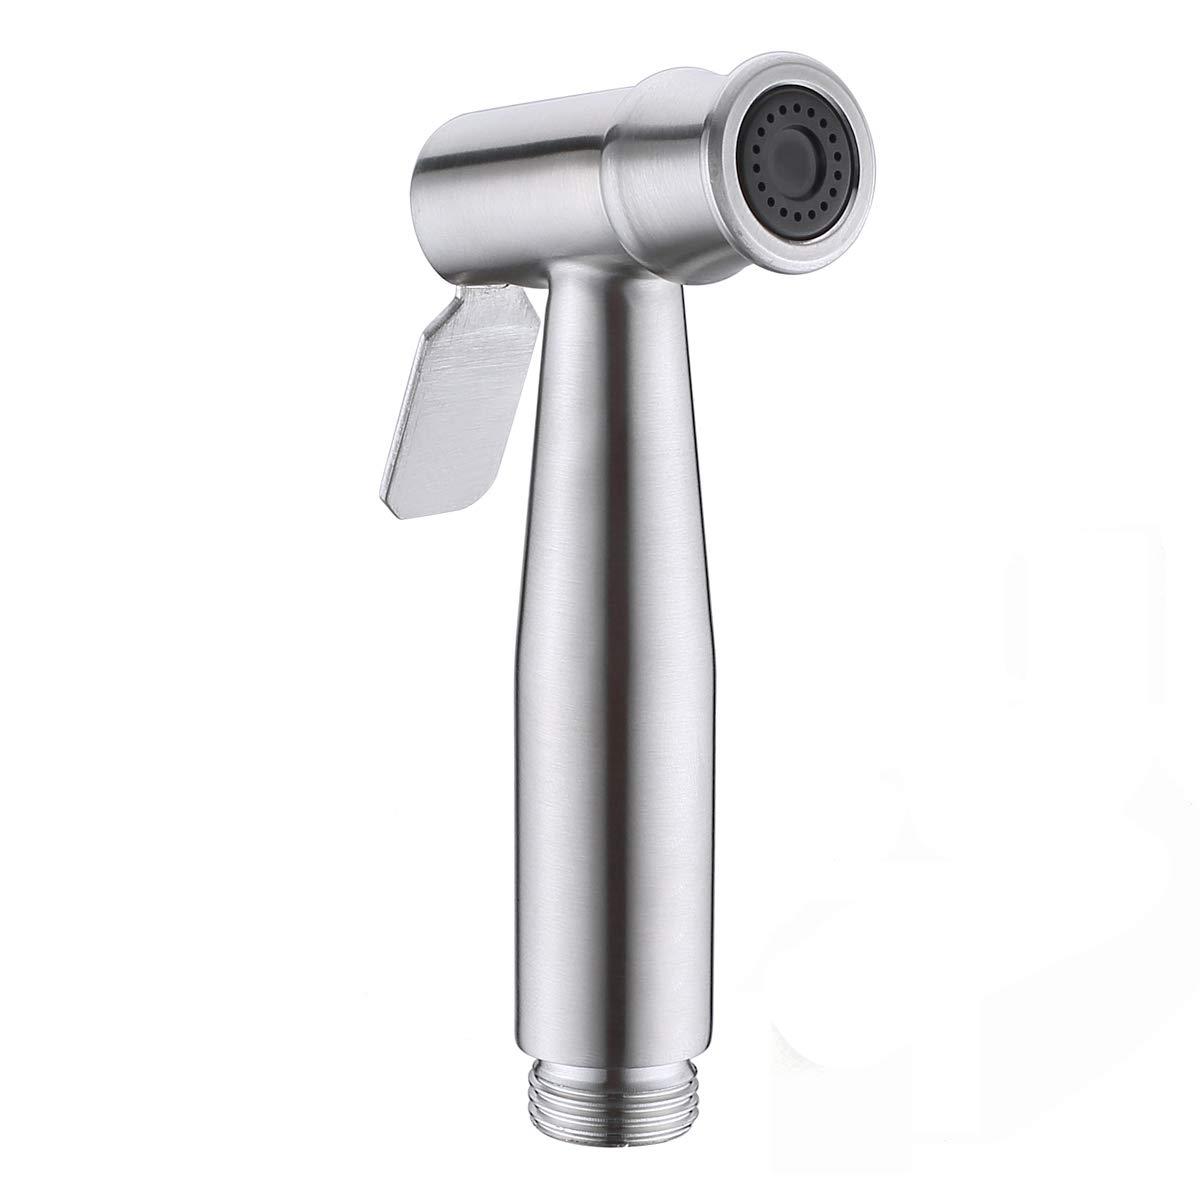 Hand Held Bidet Sprayer for Toilet, Cloth Diaper Sprayer Shattaf, Stainless Steel, Brushed Nickel …